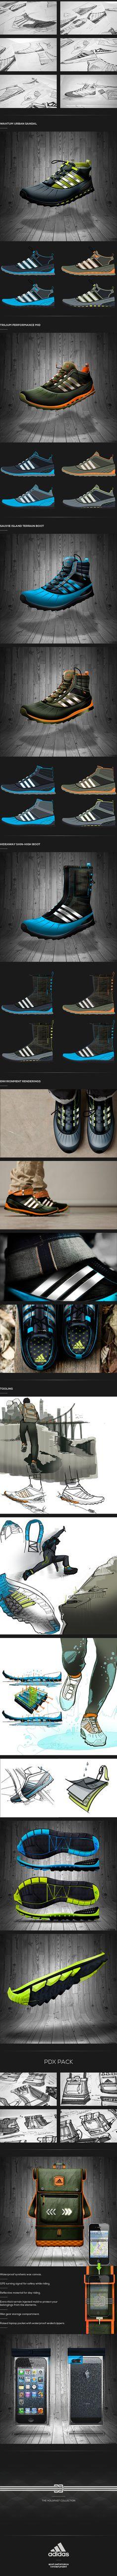 adidas x cabourn by Dan Ogren, Cedric Hudson and Guercy Eugene via Behance